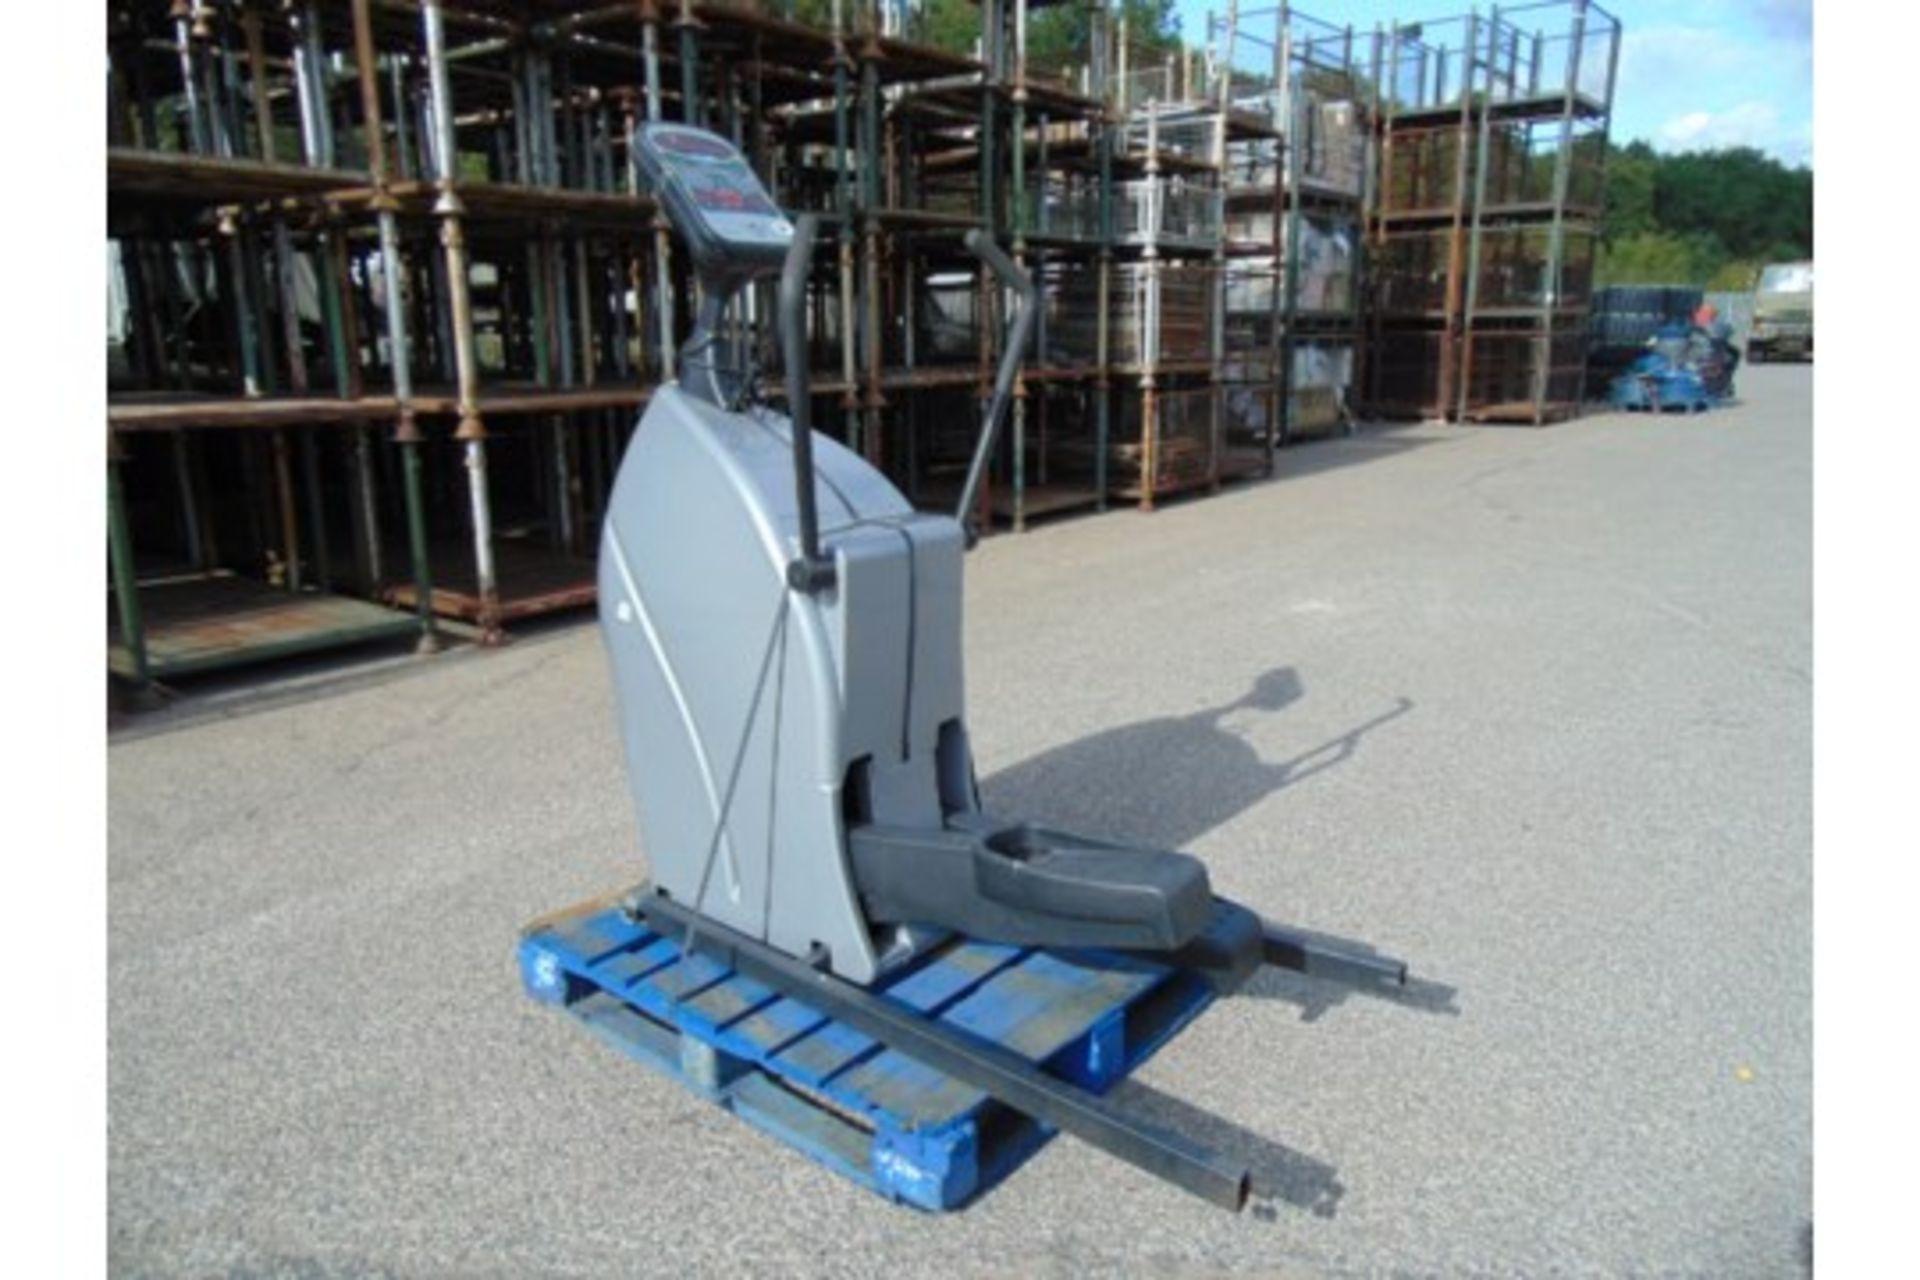 Lot 25829 - Powersport Evolution Cross Trainer